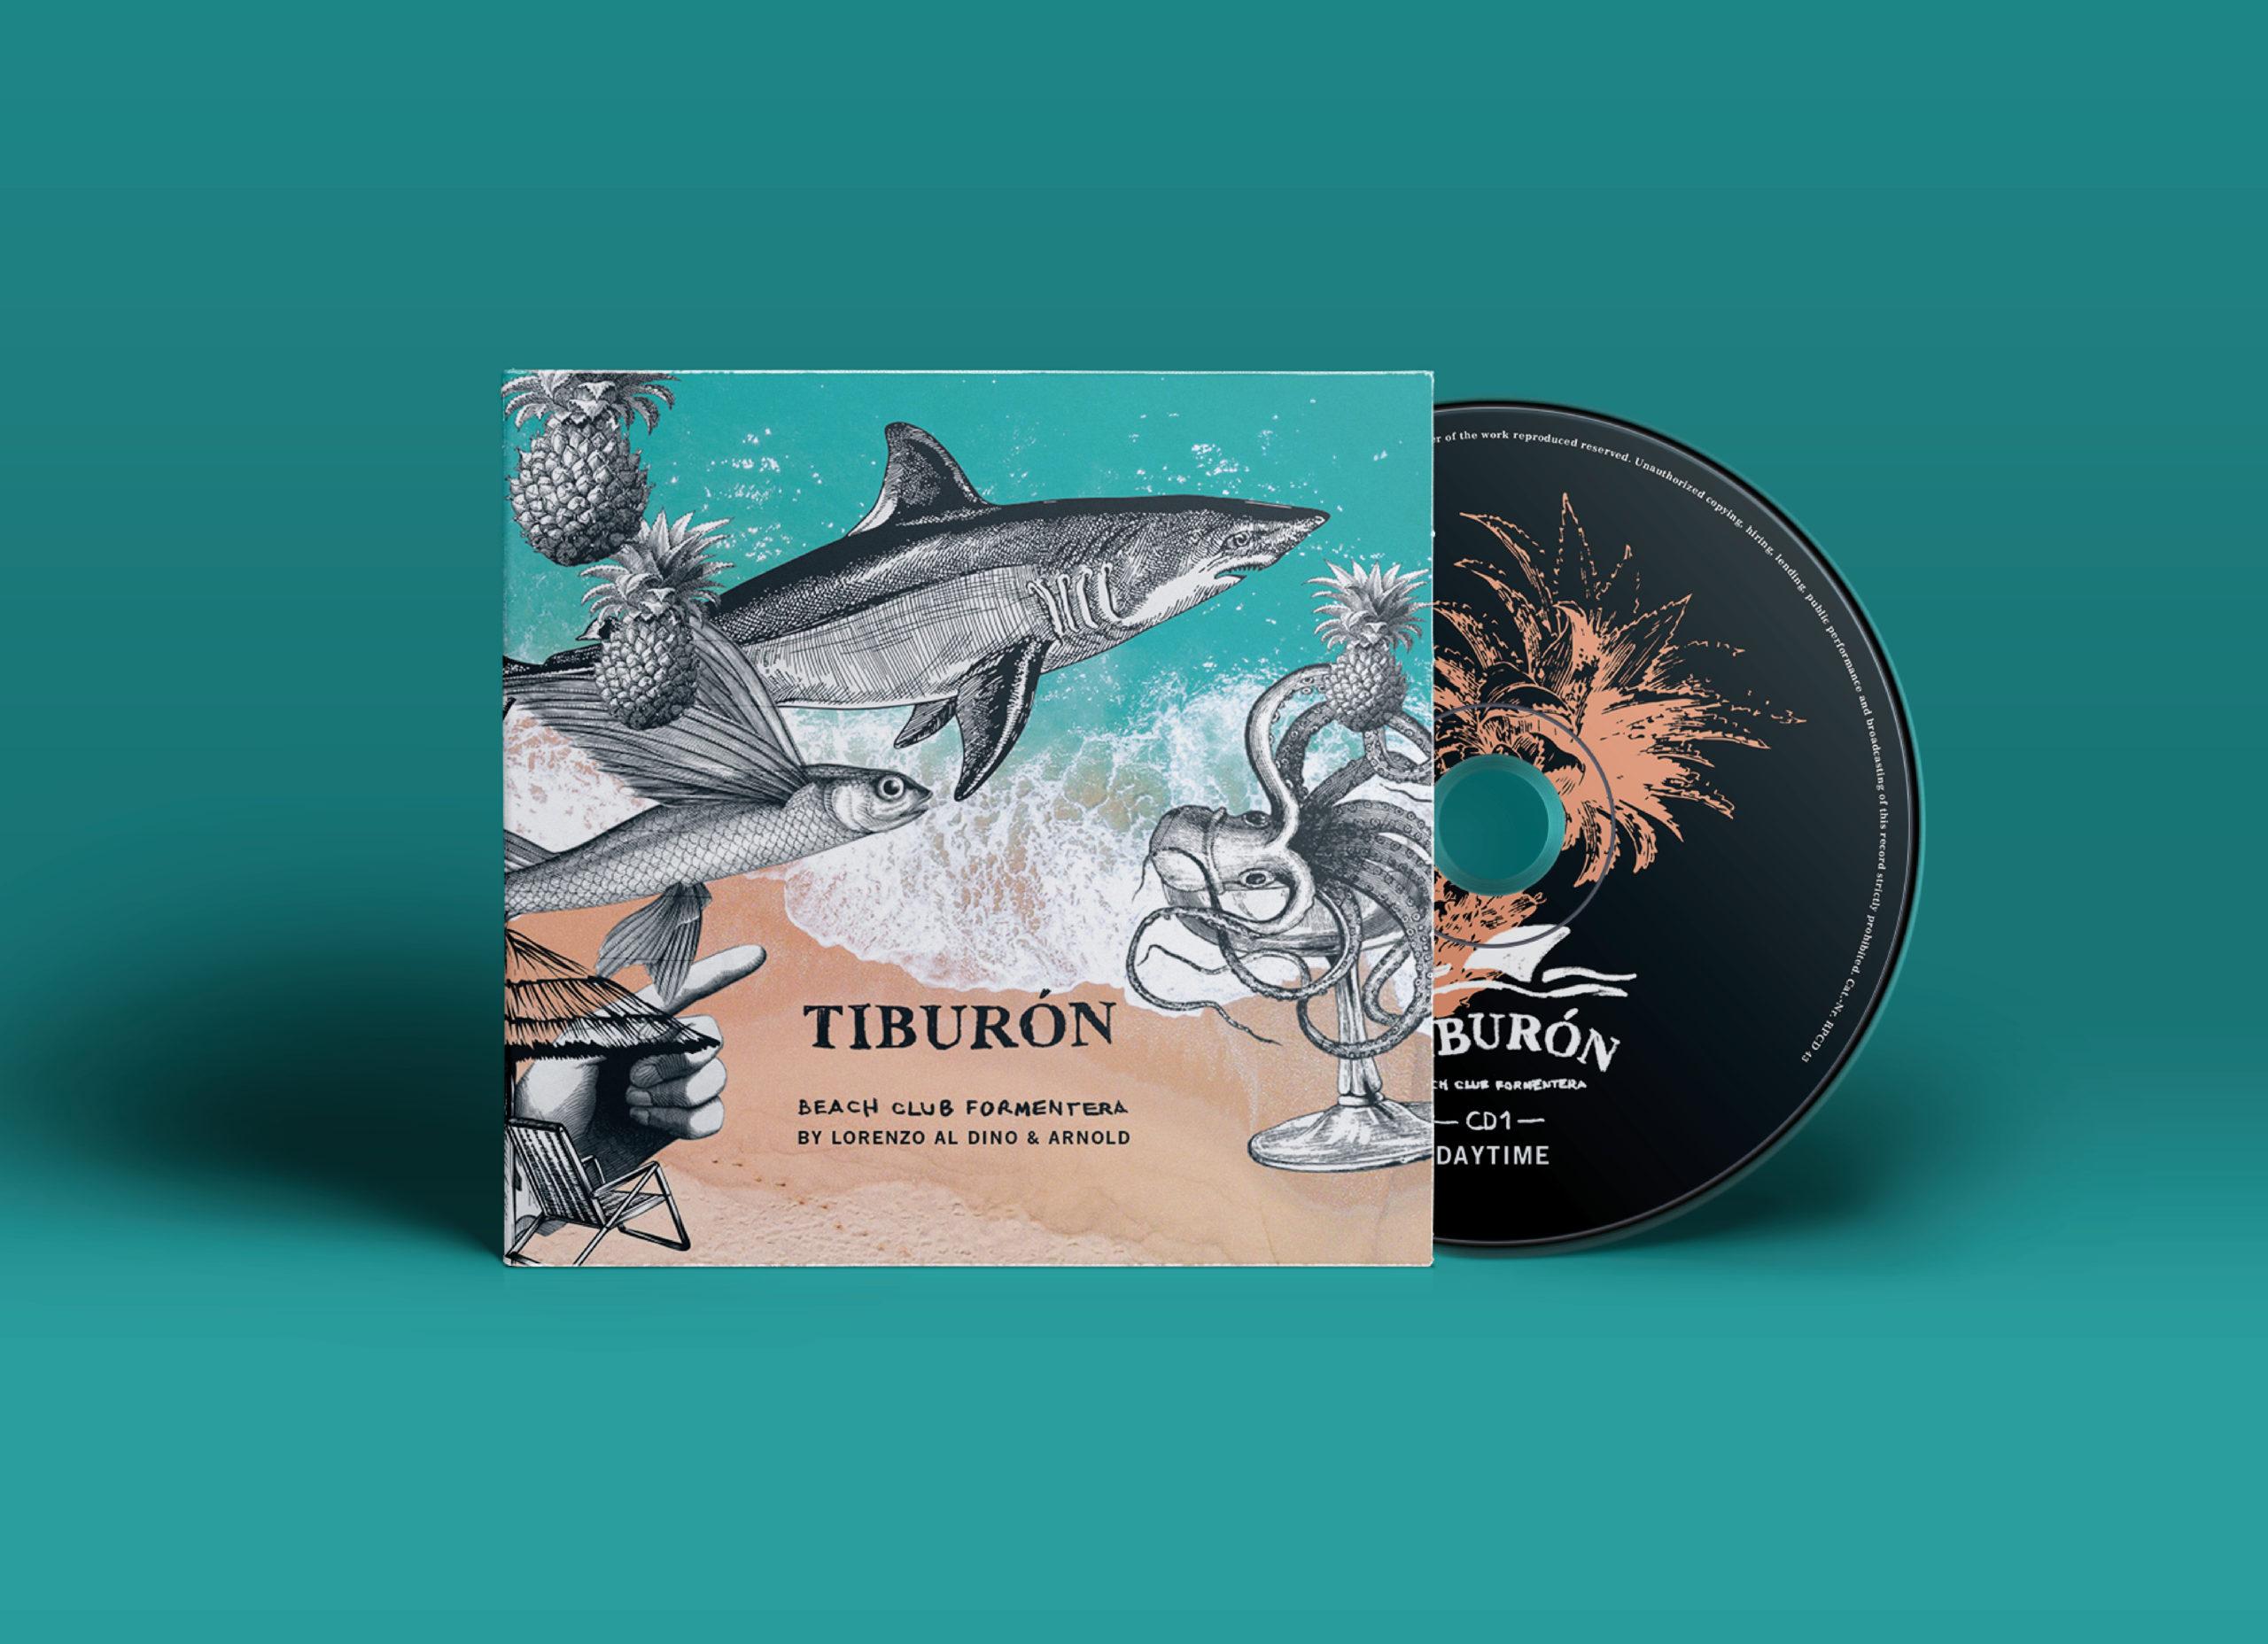 DASUNO - Nora Sri Jascha // Client: Tiburón // 2020